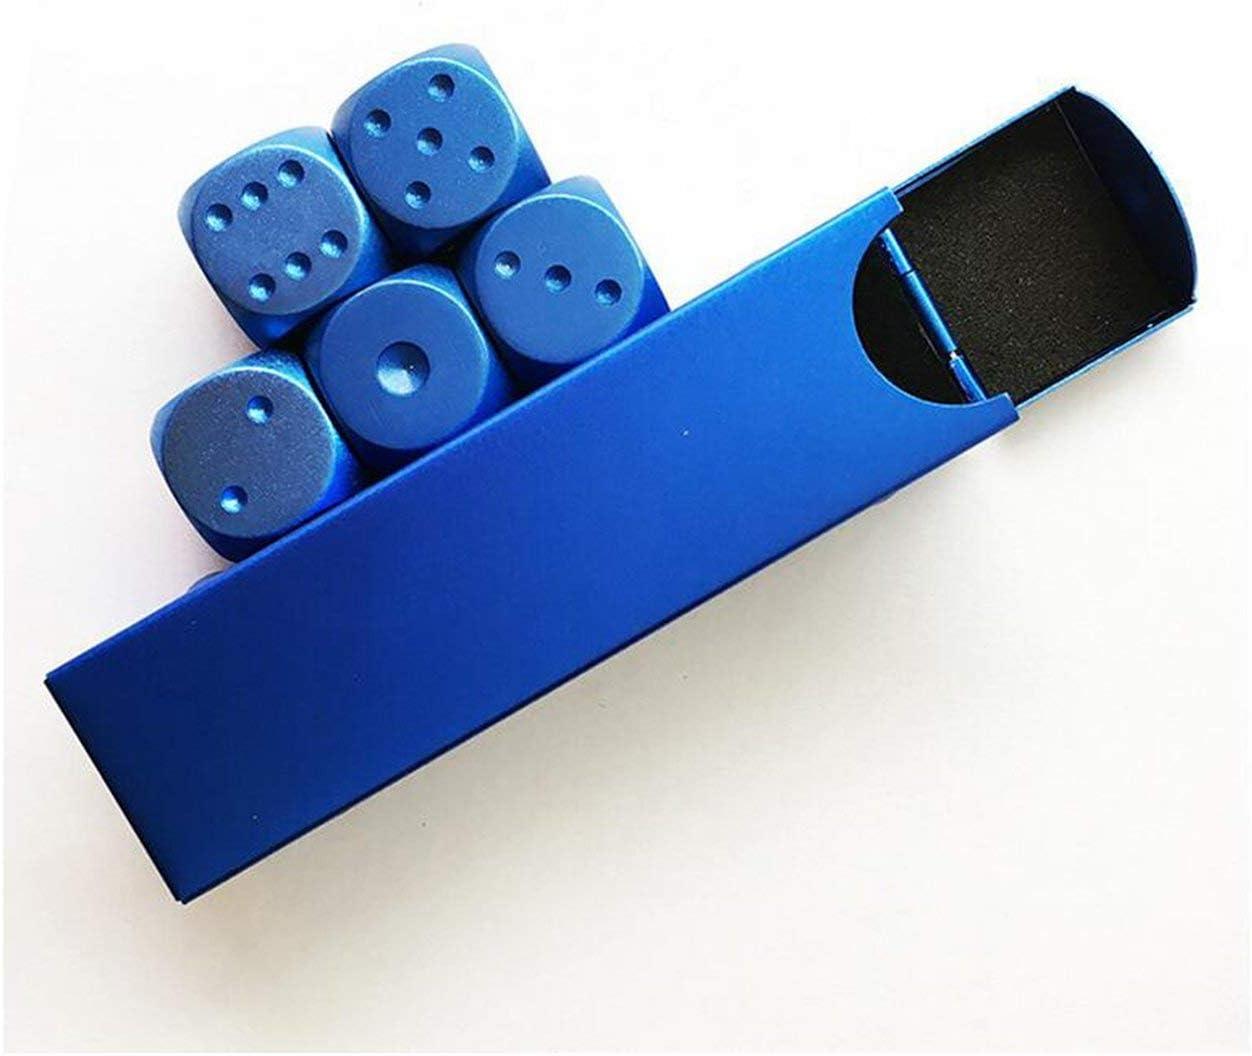 blau golden hot Ballylelly-Hohe qualit/ät 5 st/ücke Aluminium Poker solide Domino Metall w/ürfel Spiel tragbare w/ürfel Poker Party Silber